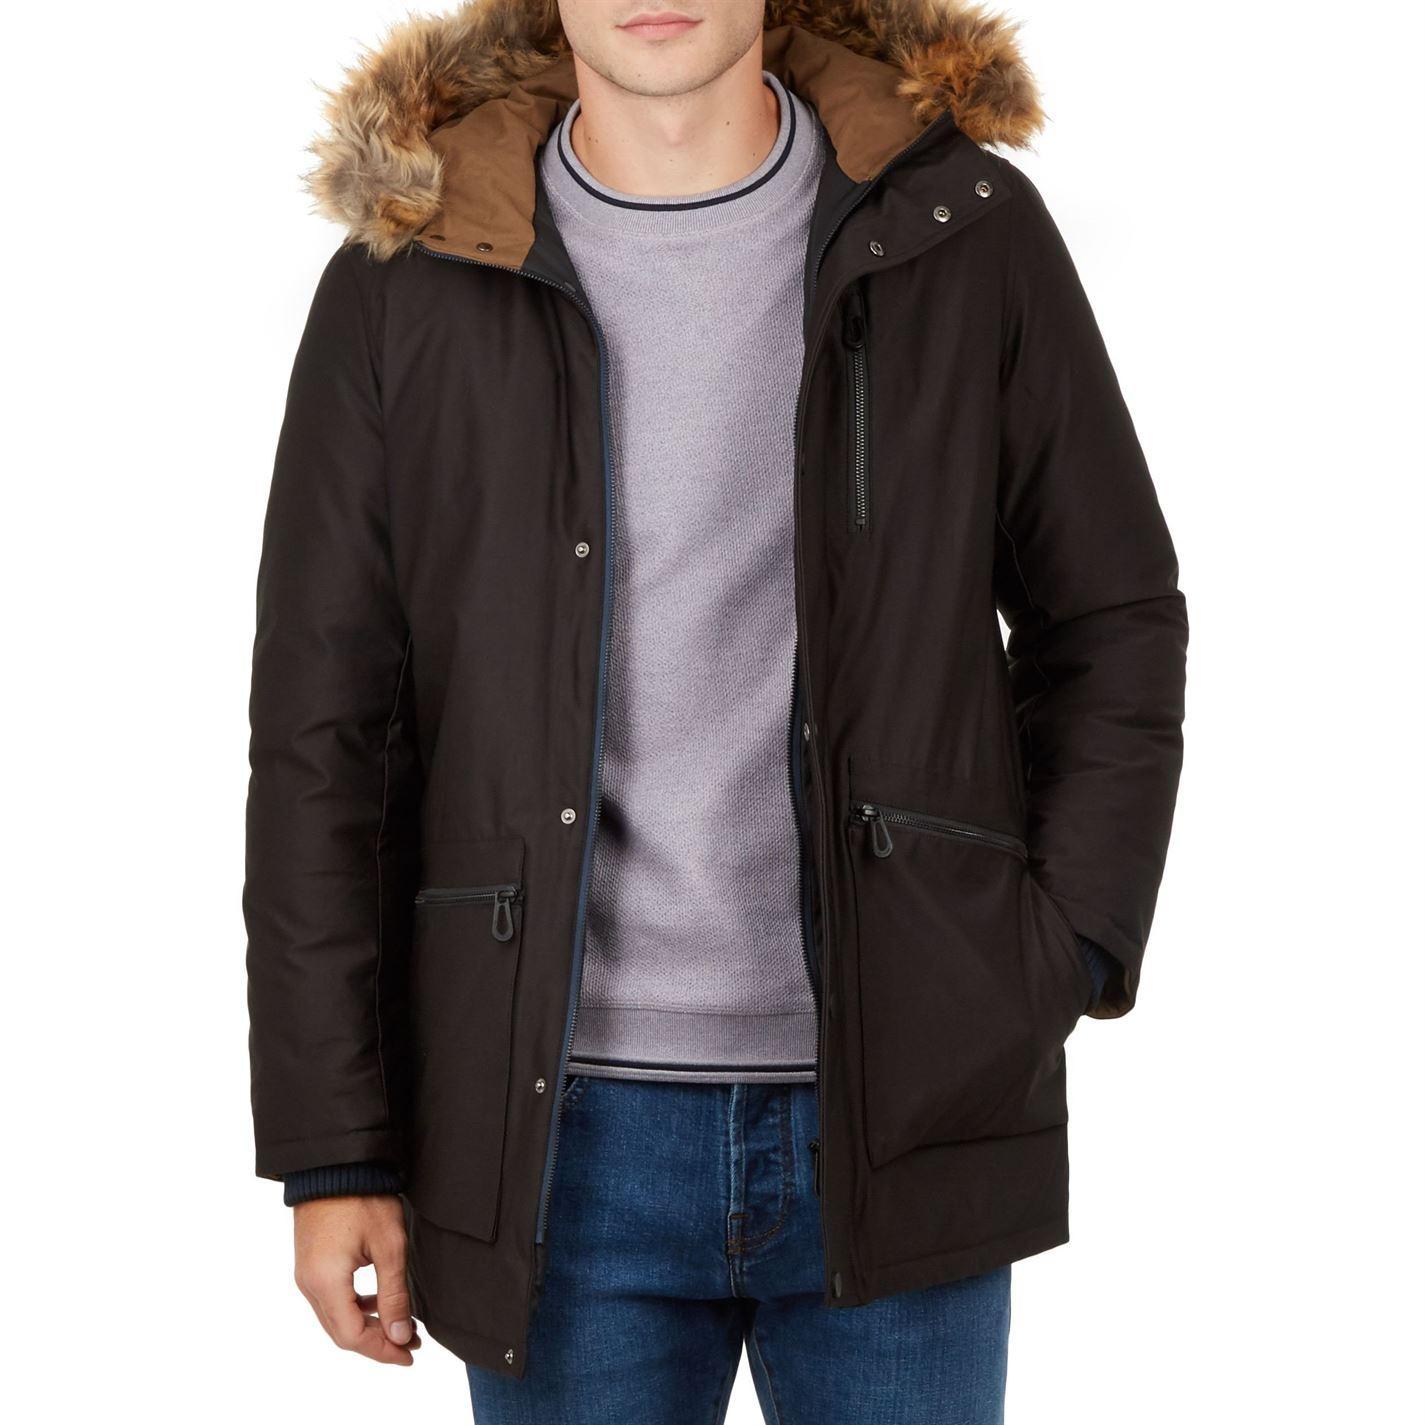 00598ca1408 Men's Black Gouda Parka Jacket